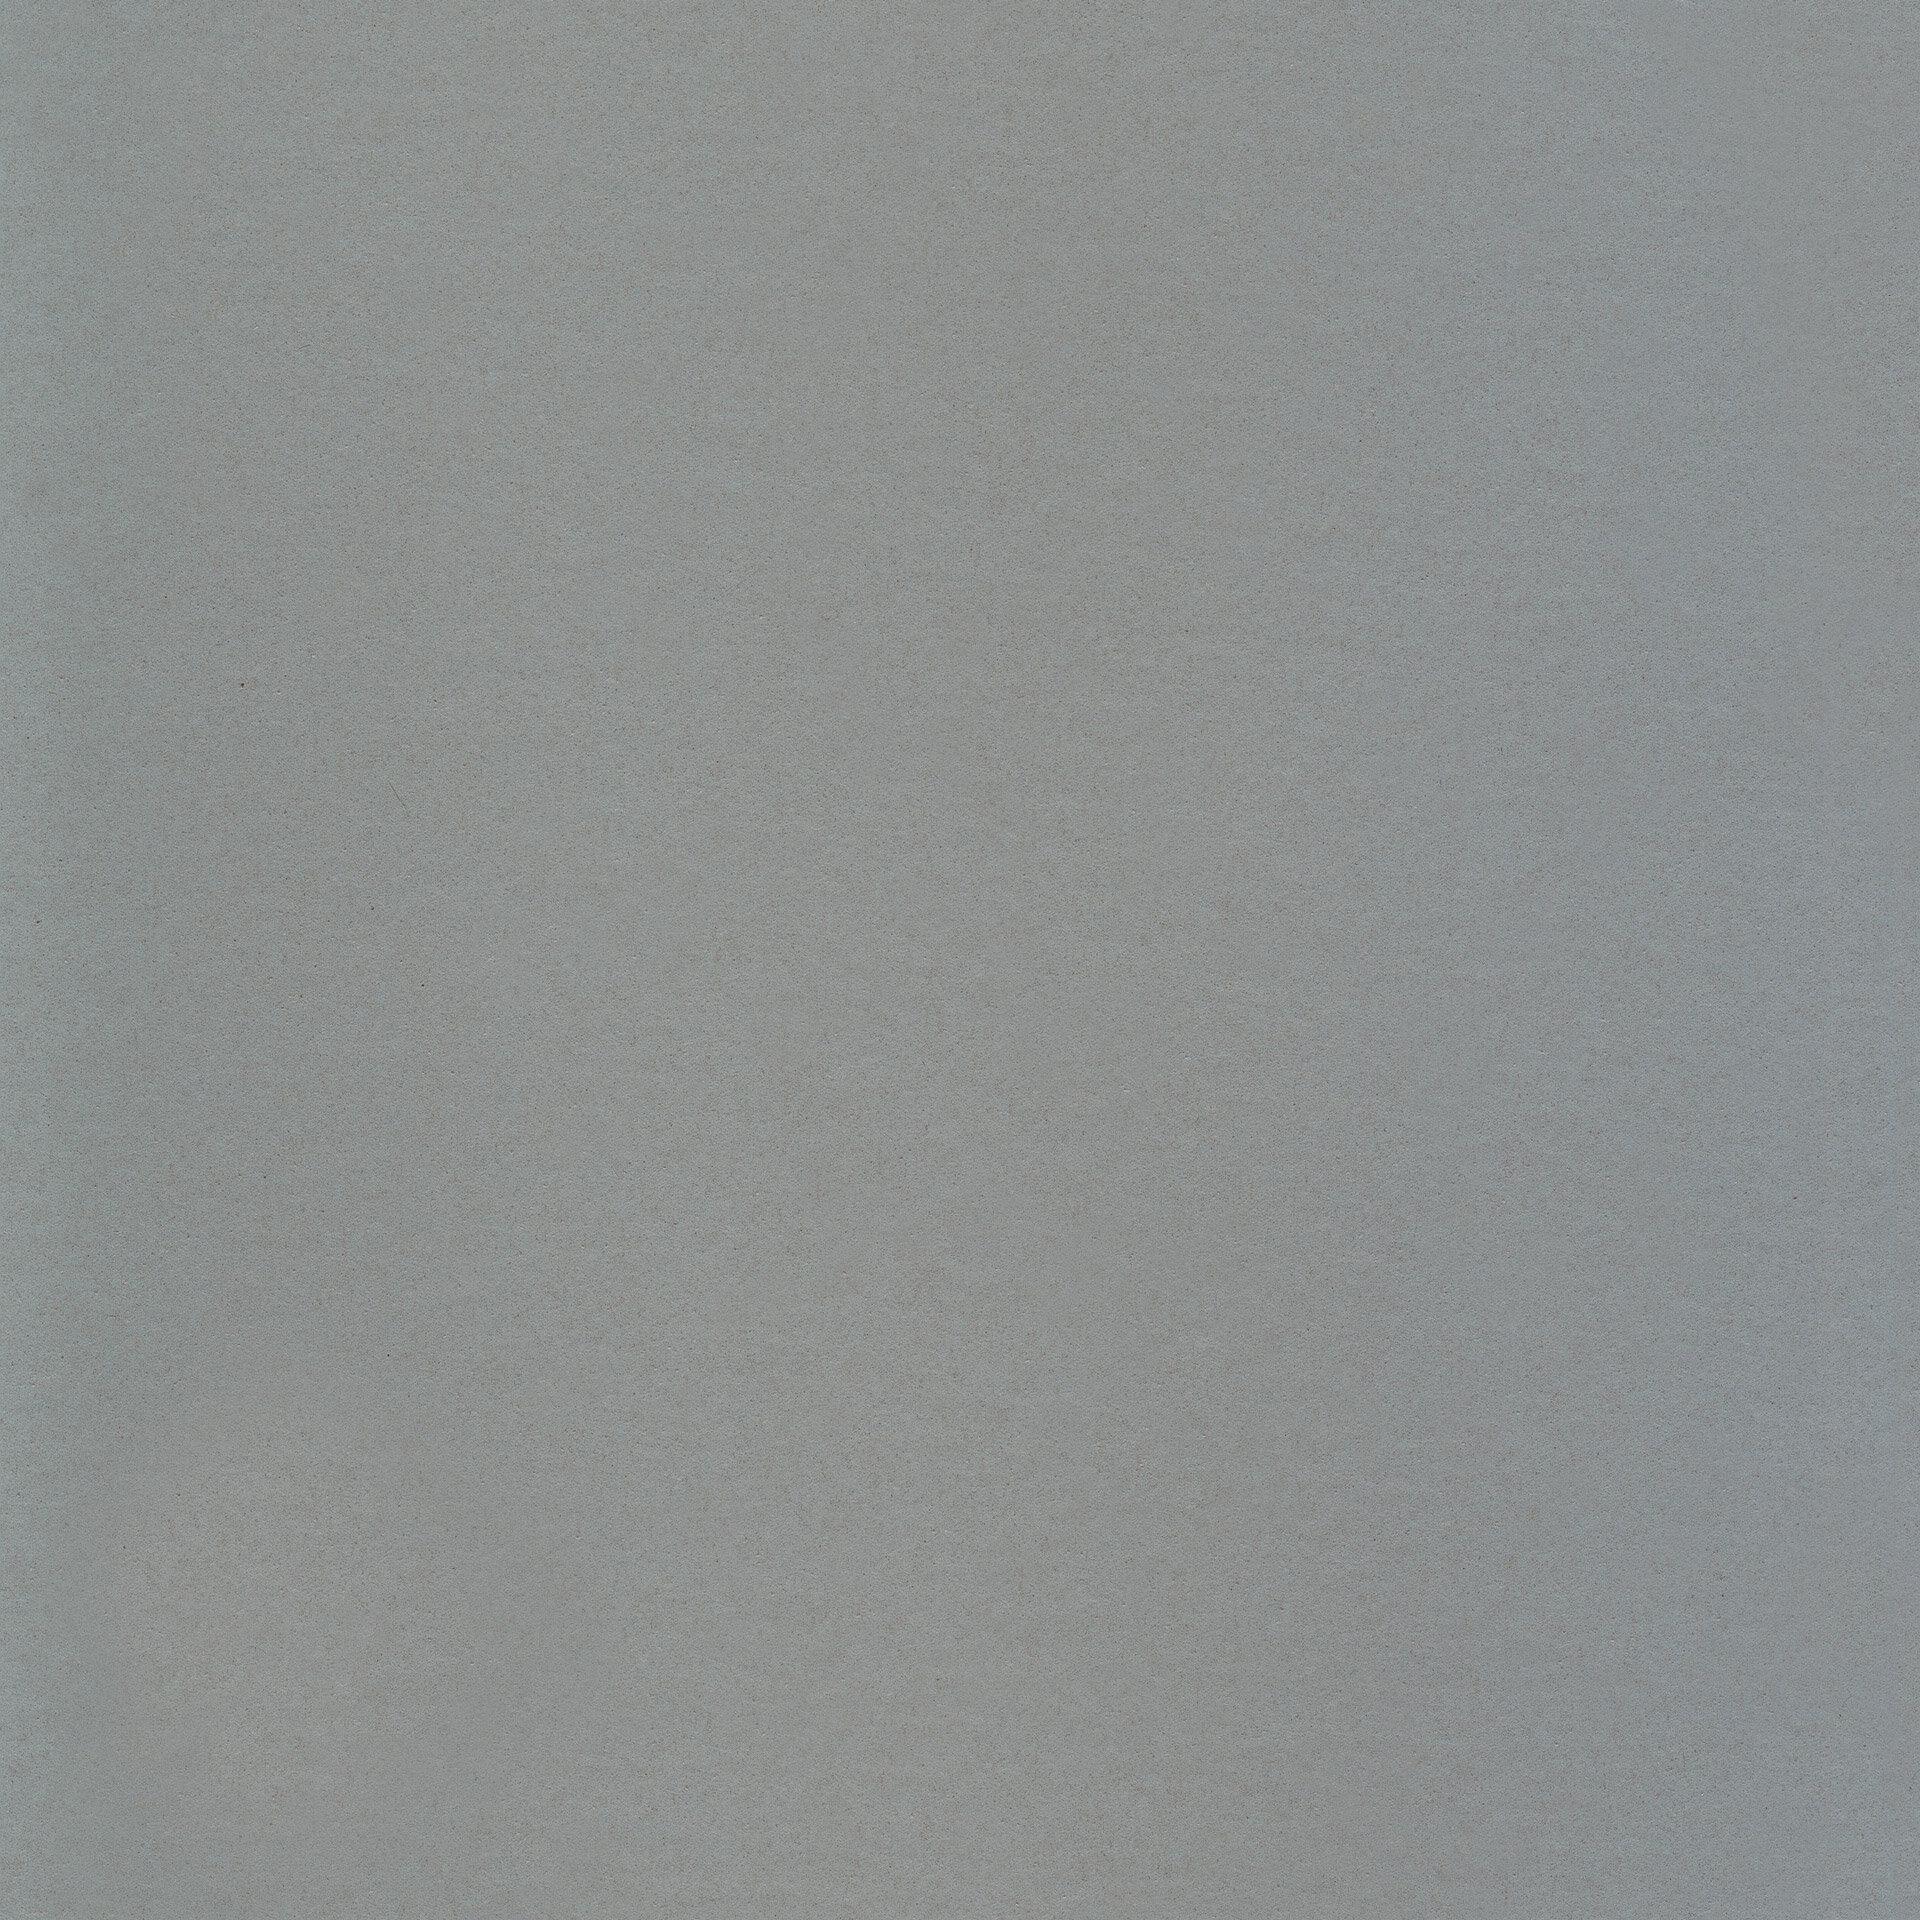 dlw uni walton linoleum broken grey lpx 2 5 mm. Black Bedroom Furniture Sets. Home Design Ideas